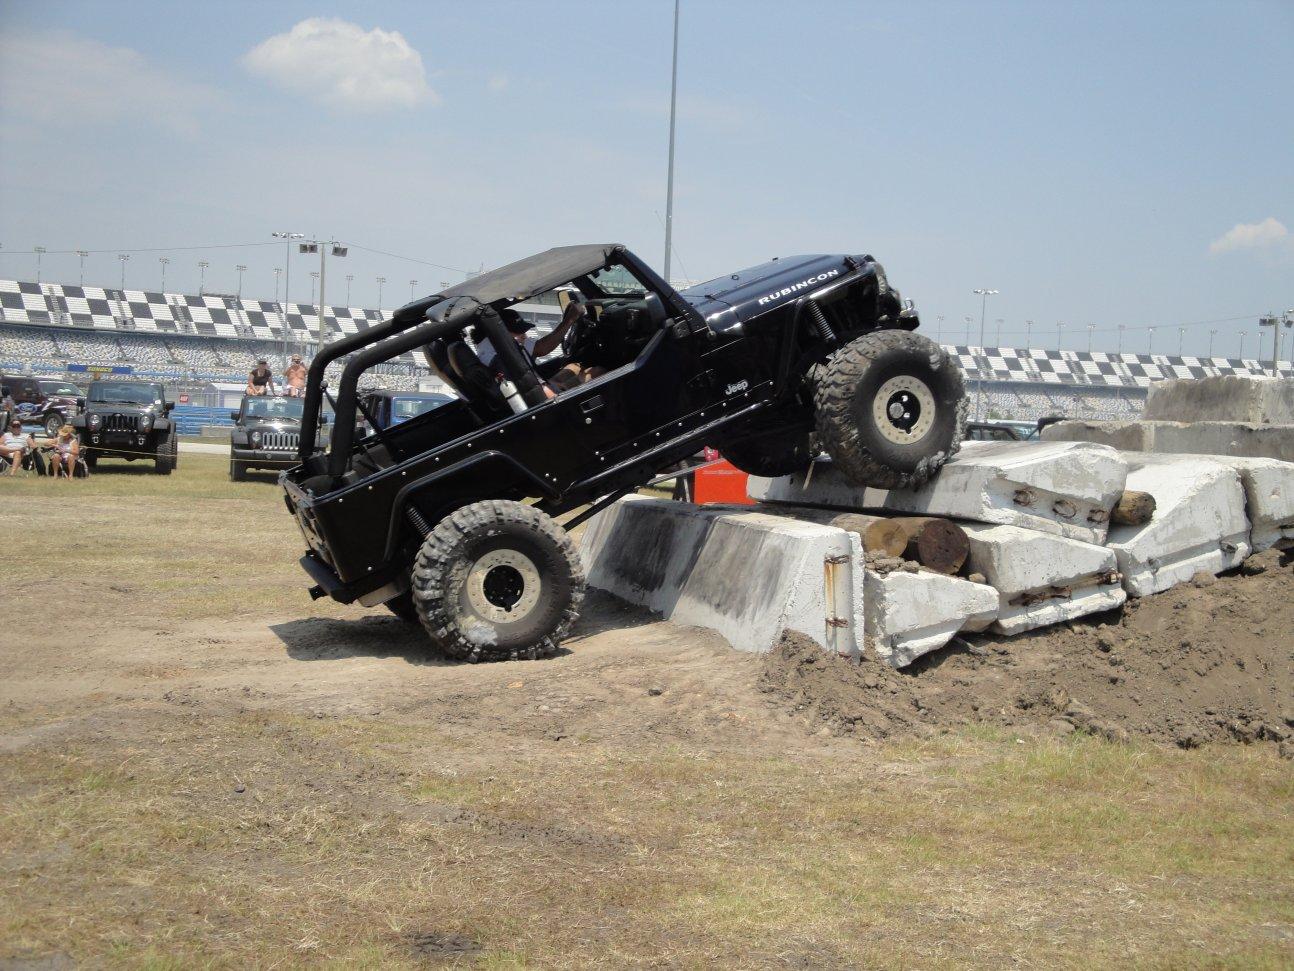 jeep-beach-577.jpg